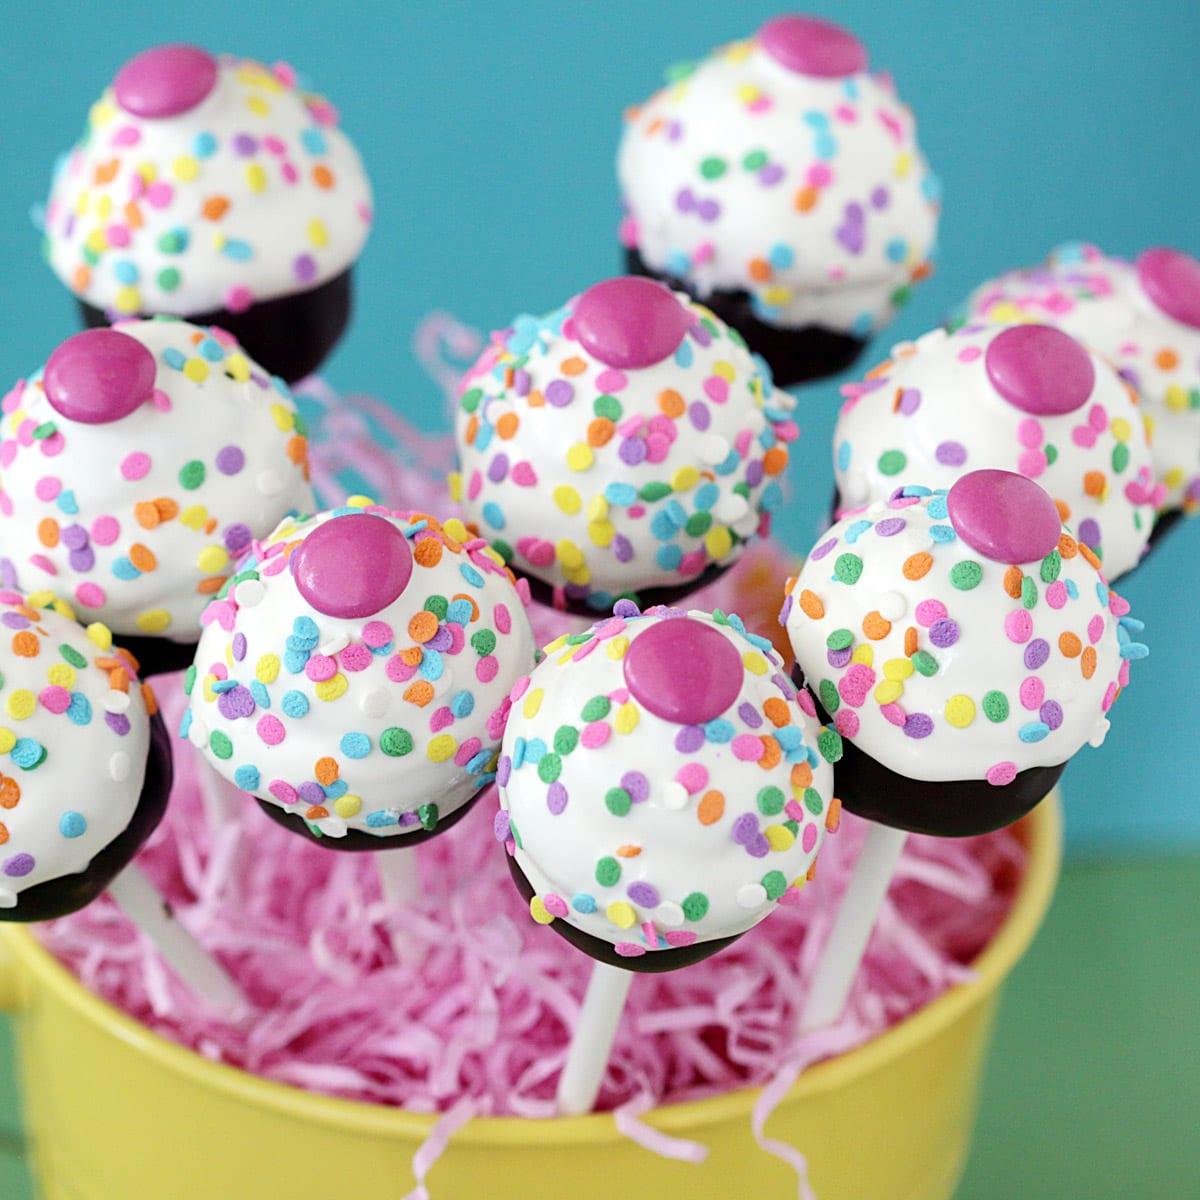 Cake Pops O Chupachups Con Coraz 243 N De Oreo 191 Con Qu 233 Los